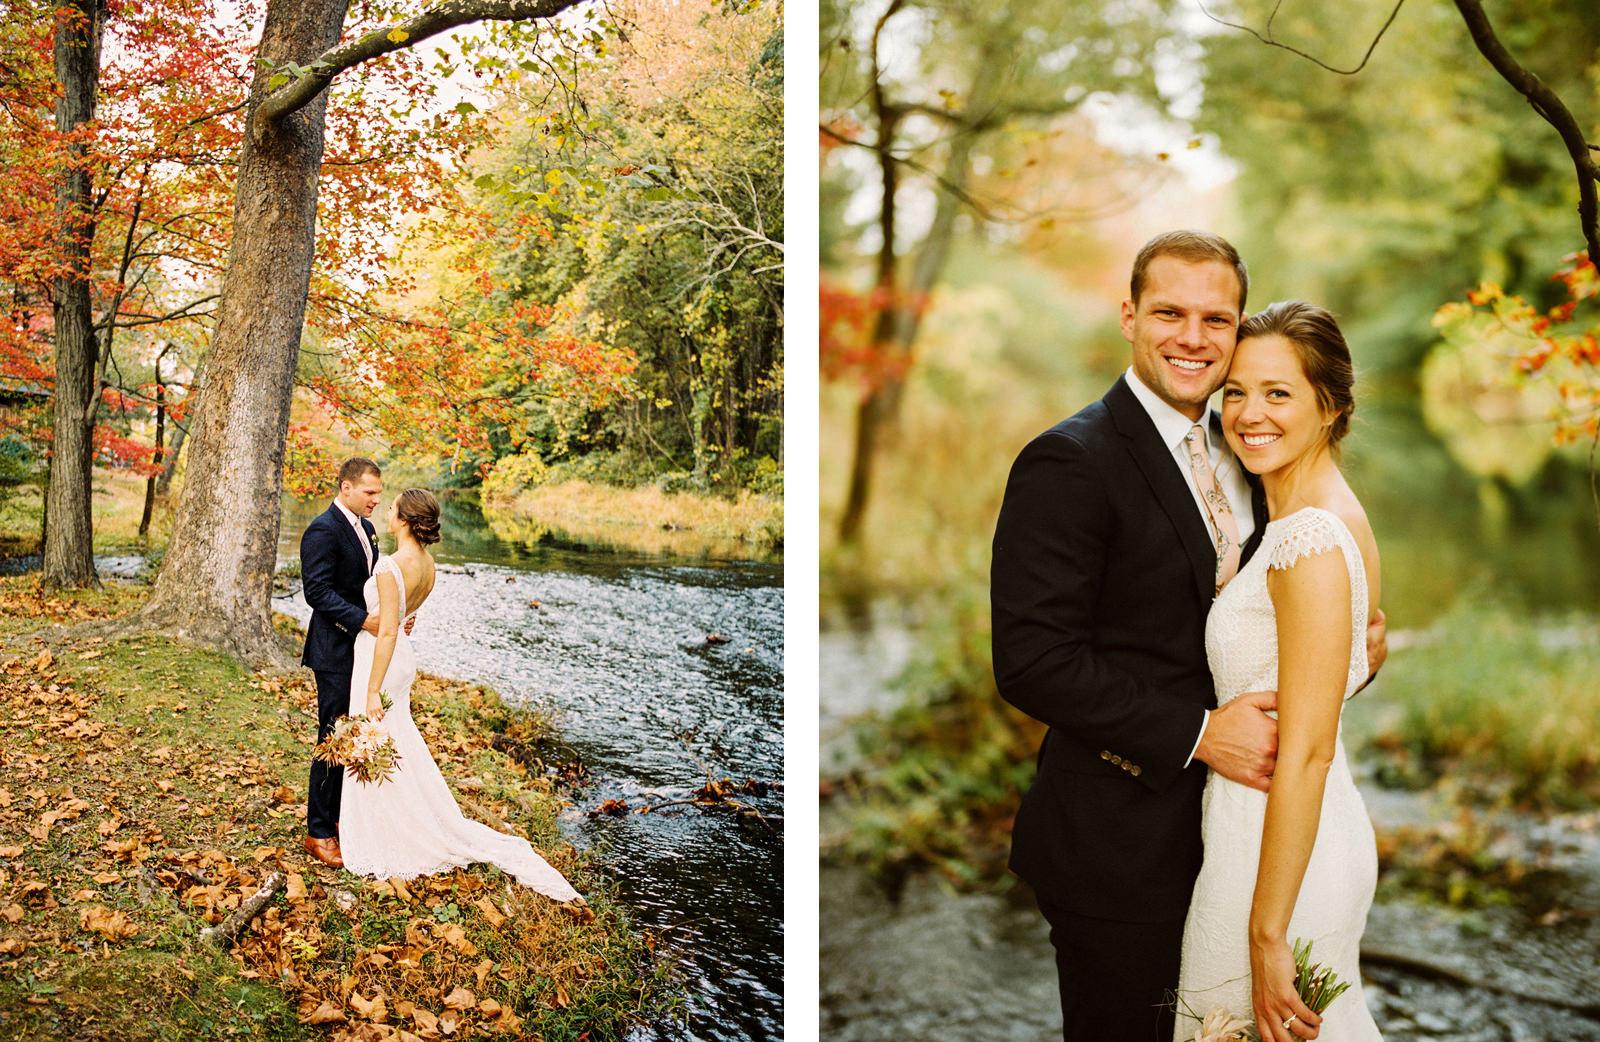 bridgeport-wedding-104 BRIDGEPORT, CONNECTICUT BACKYARD WEDDING